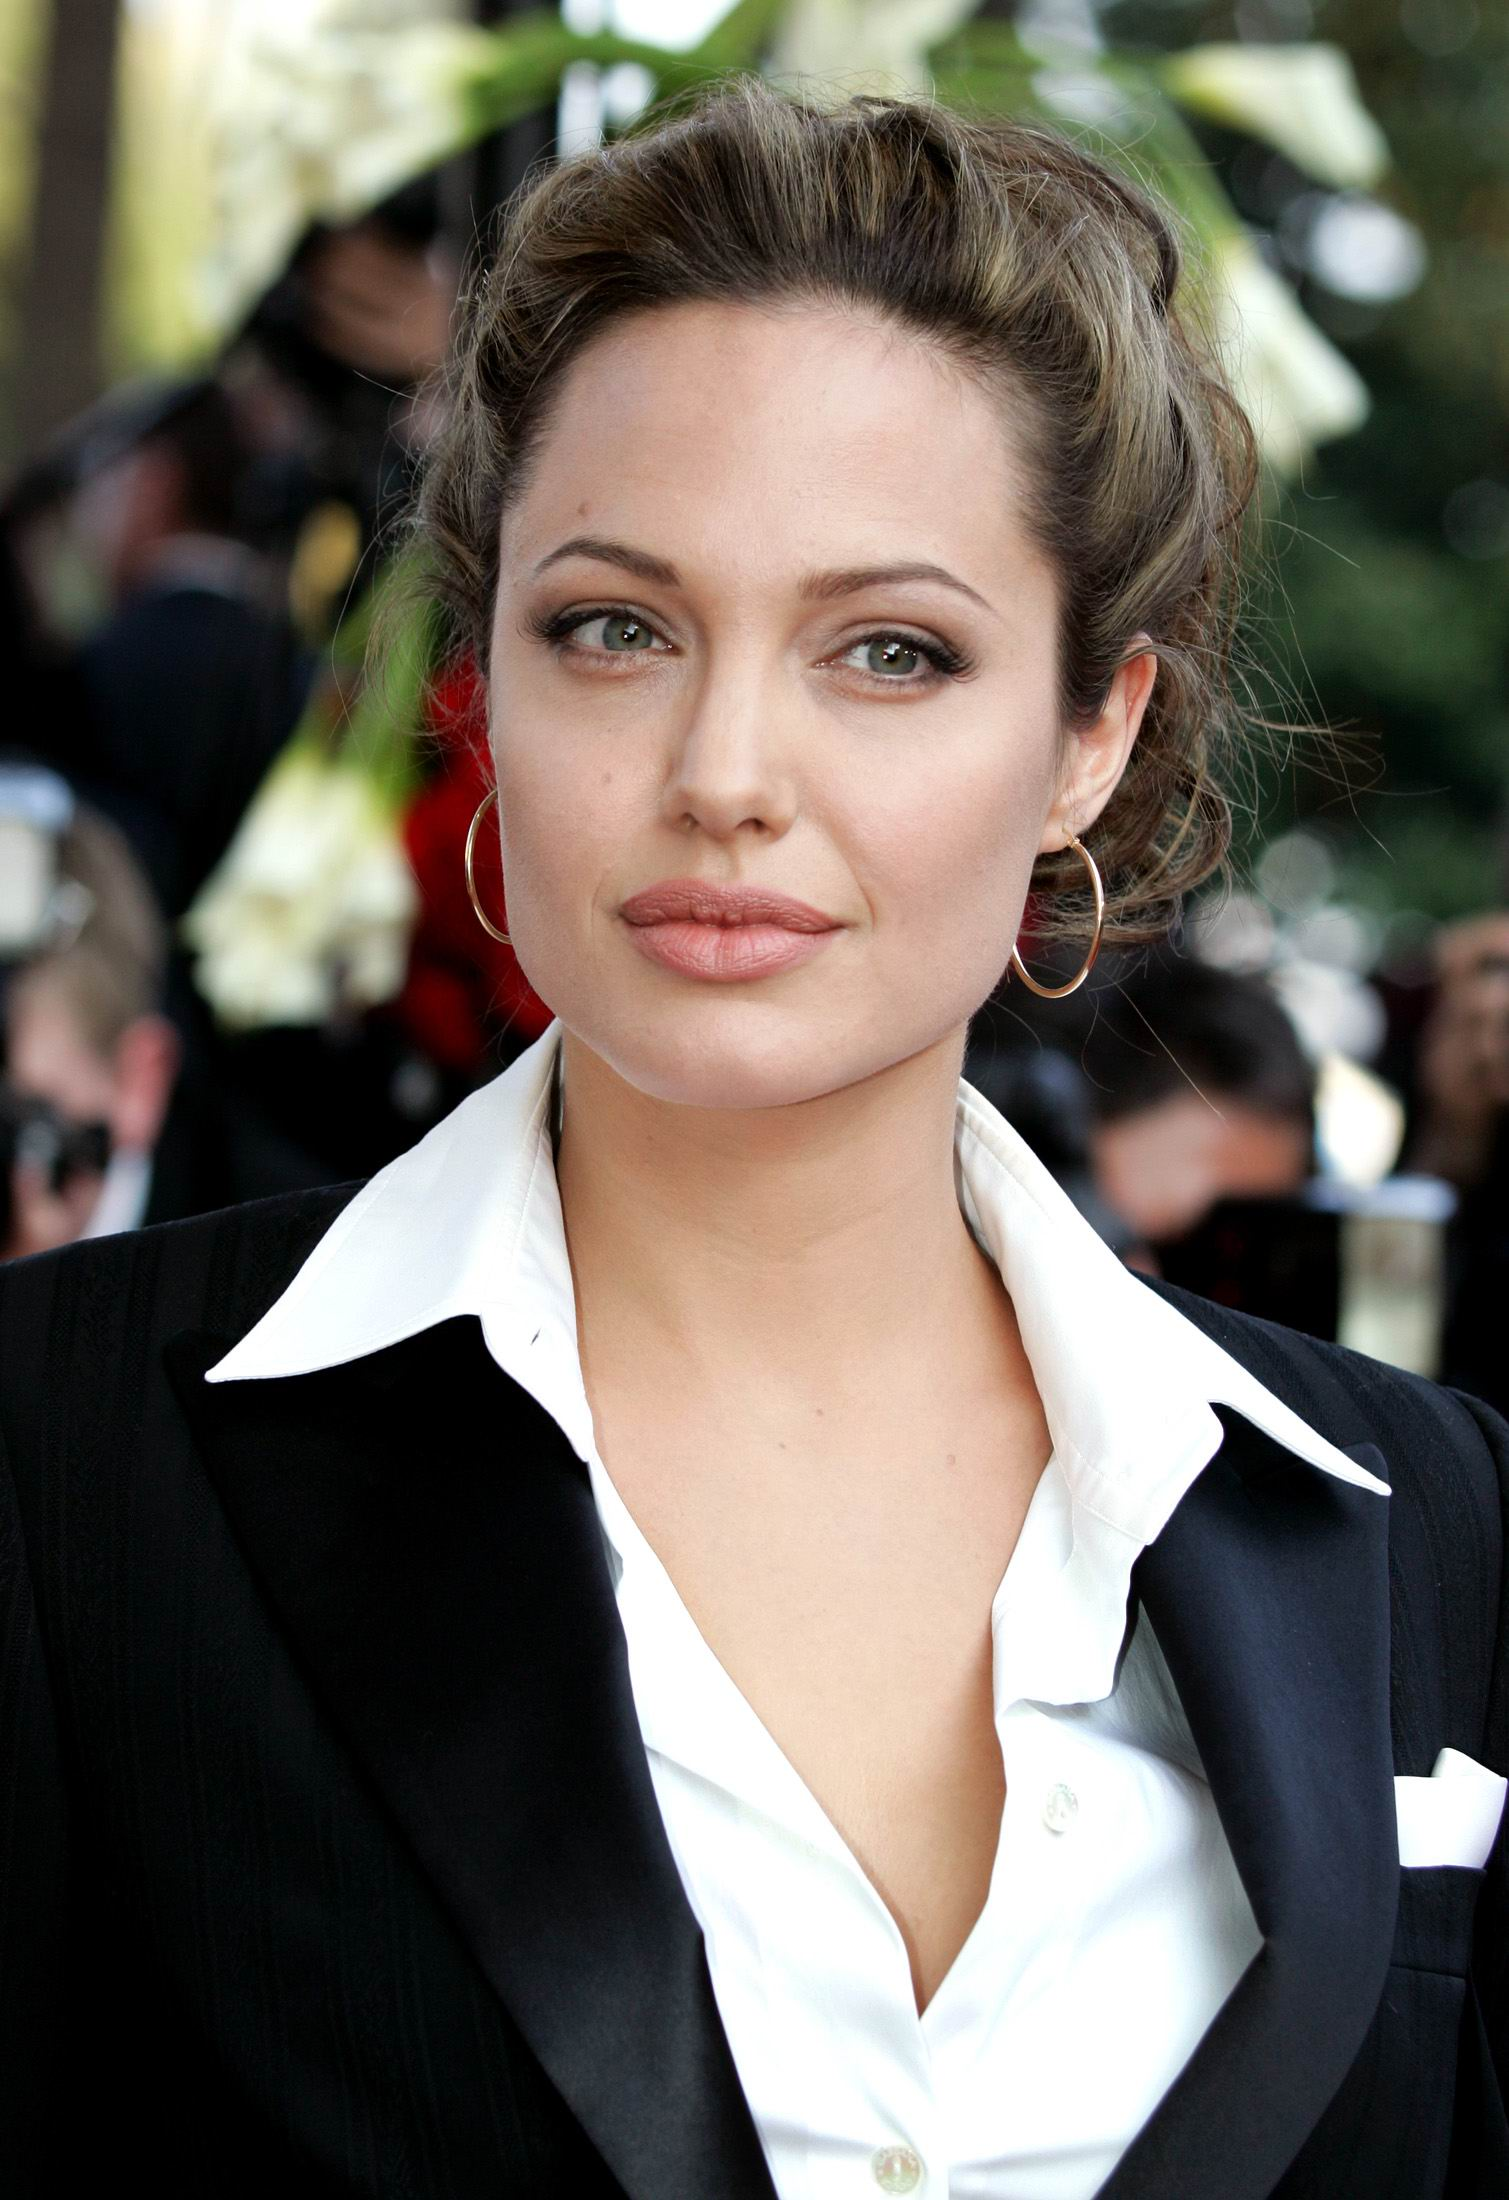 Angela de luc besson online dating 2